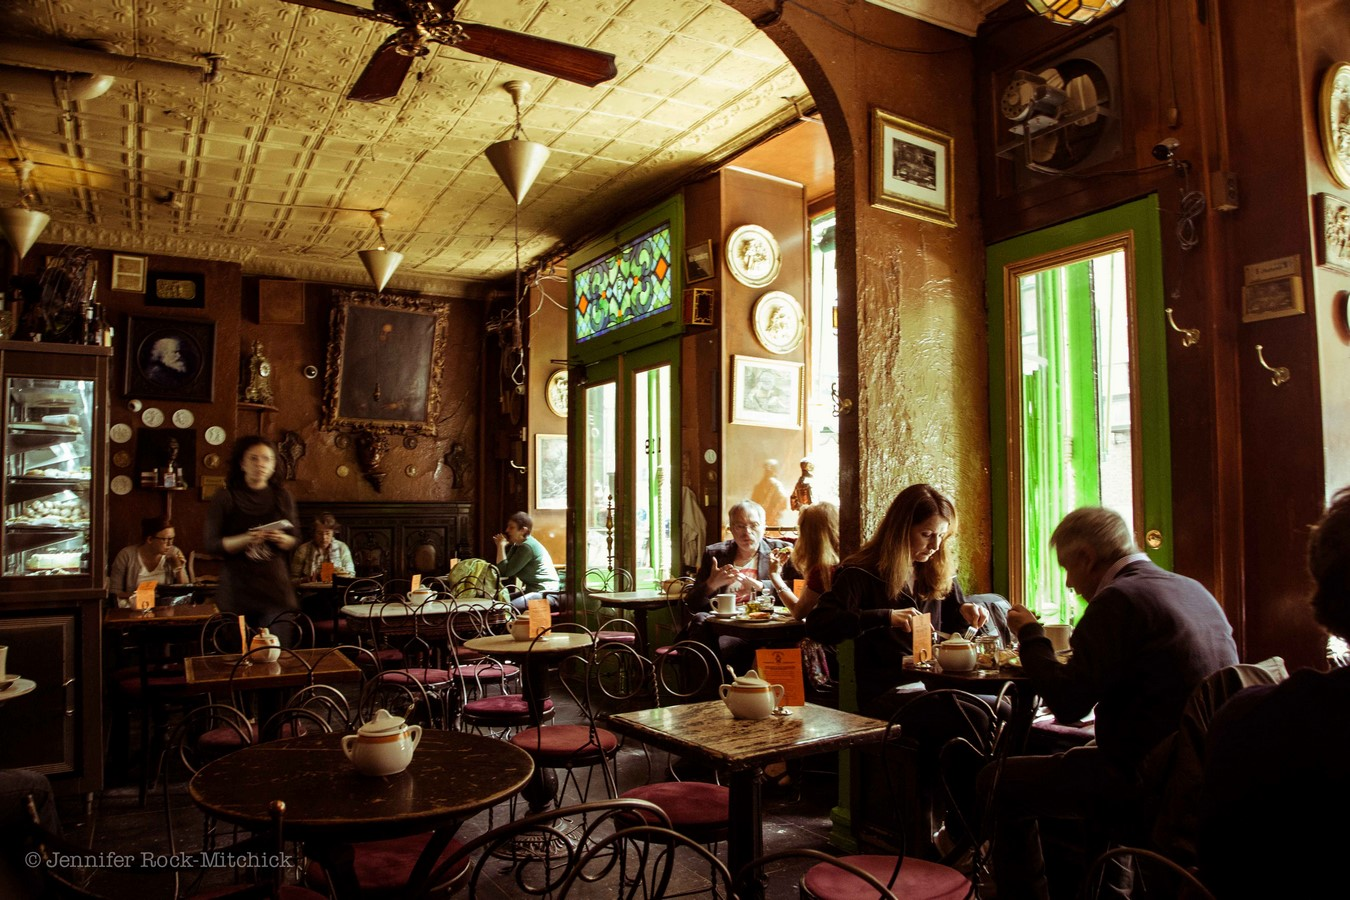 Caffè Reggio, New York City: The Oldest Bohemian Hangout - Sheet6